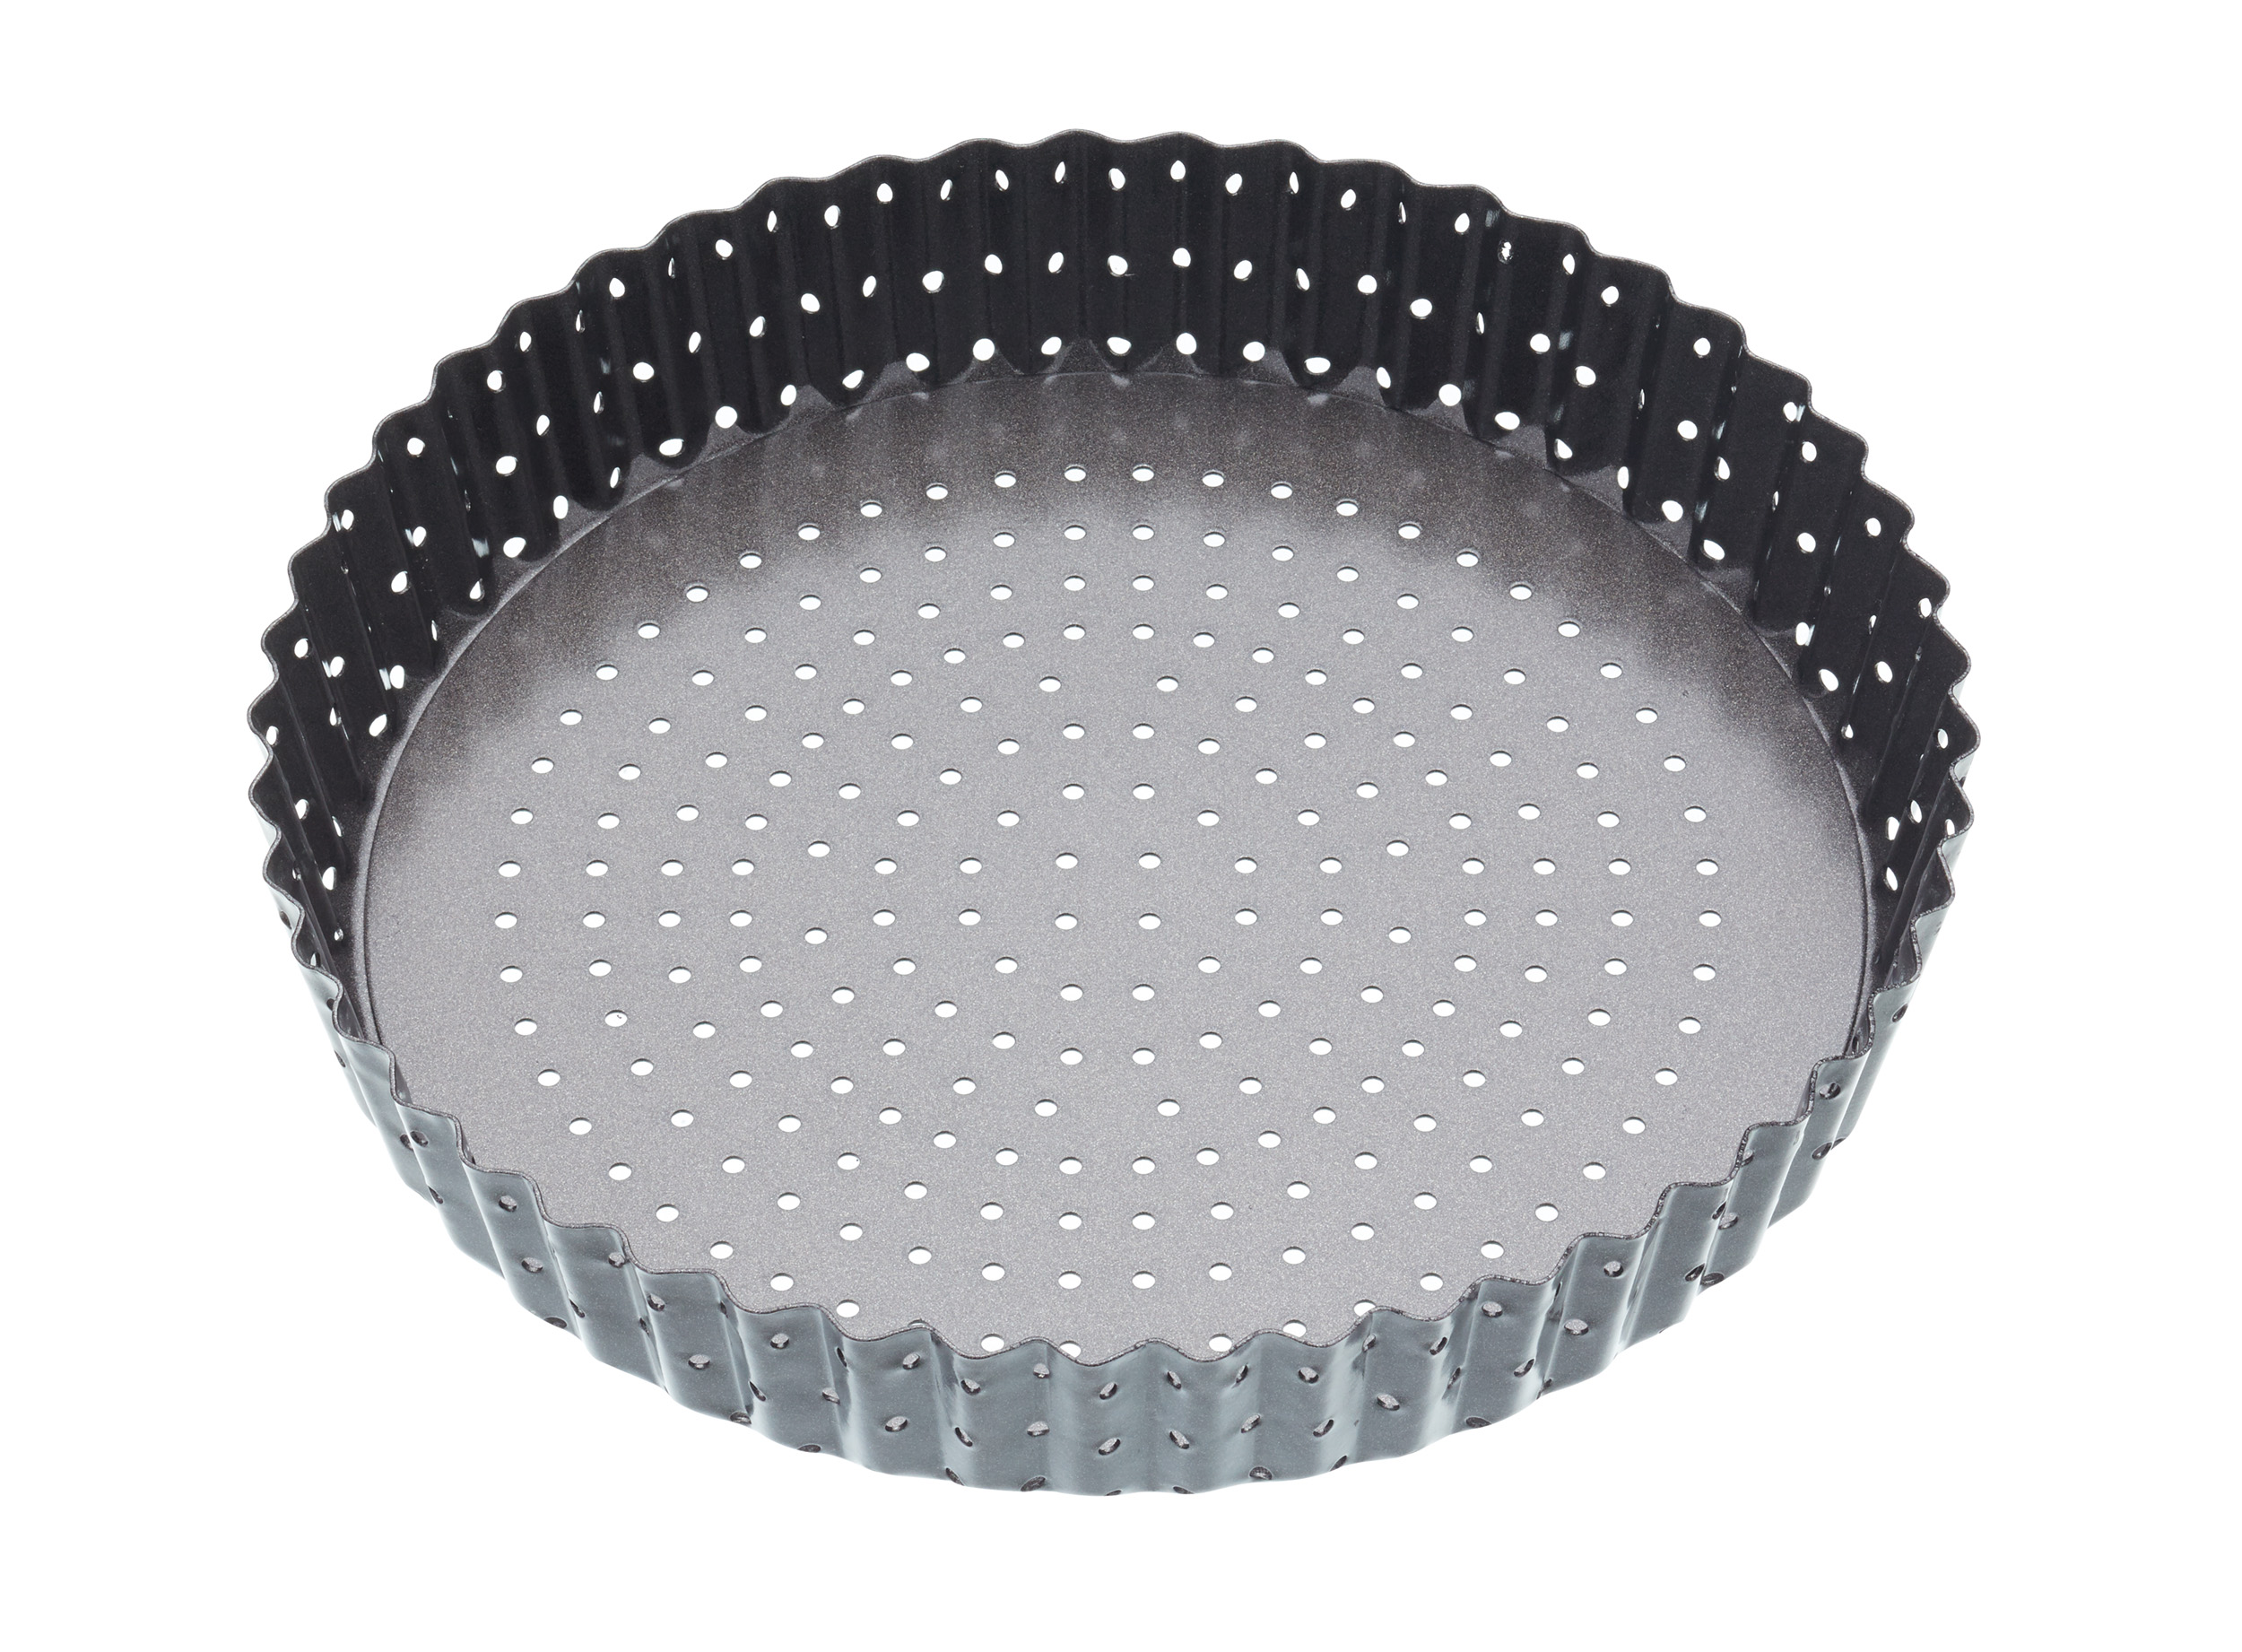 Crusty Bake Pajform 25 cm Carbon